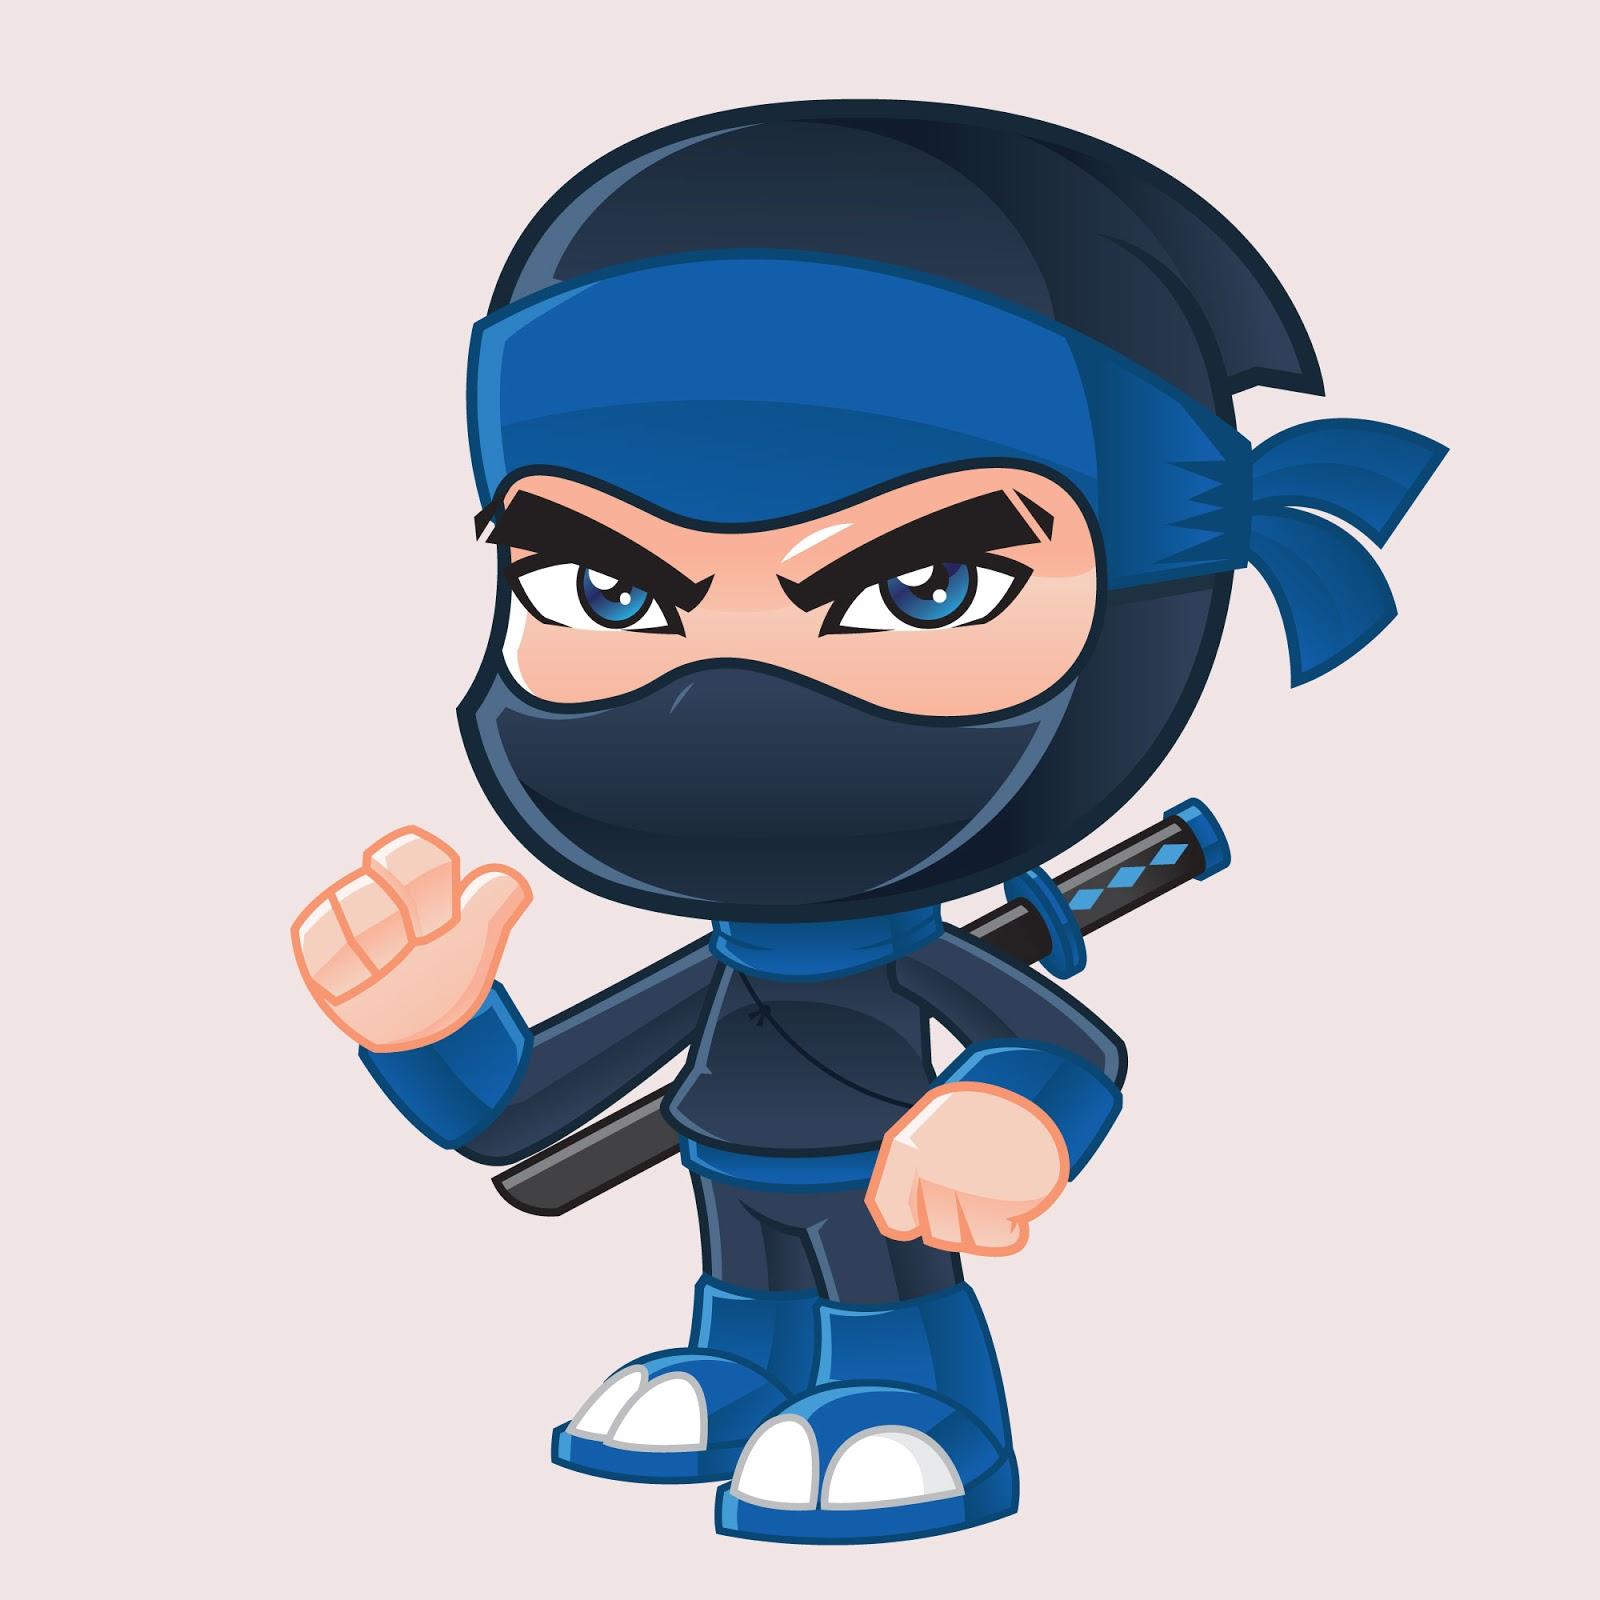 Ninja Mascot Illustration Free Download Vector CDR, AI, EPS and PNG Formats